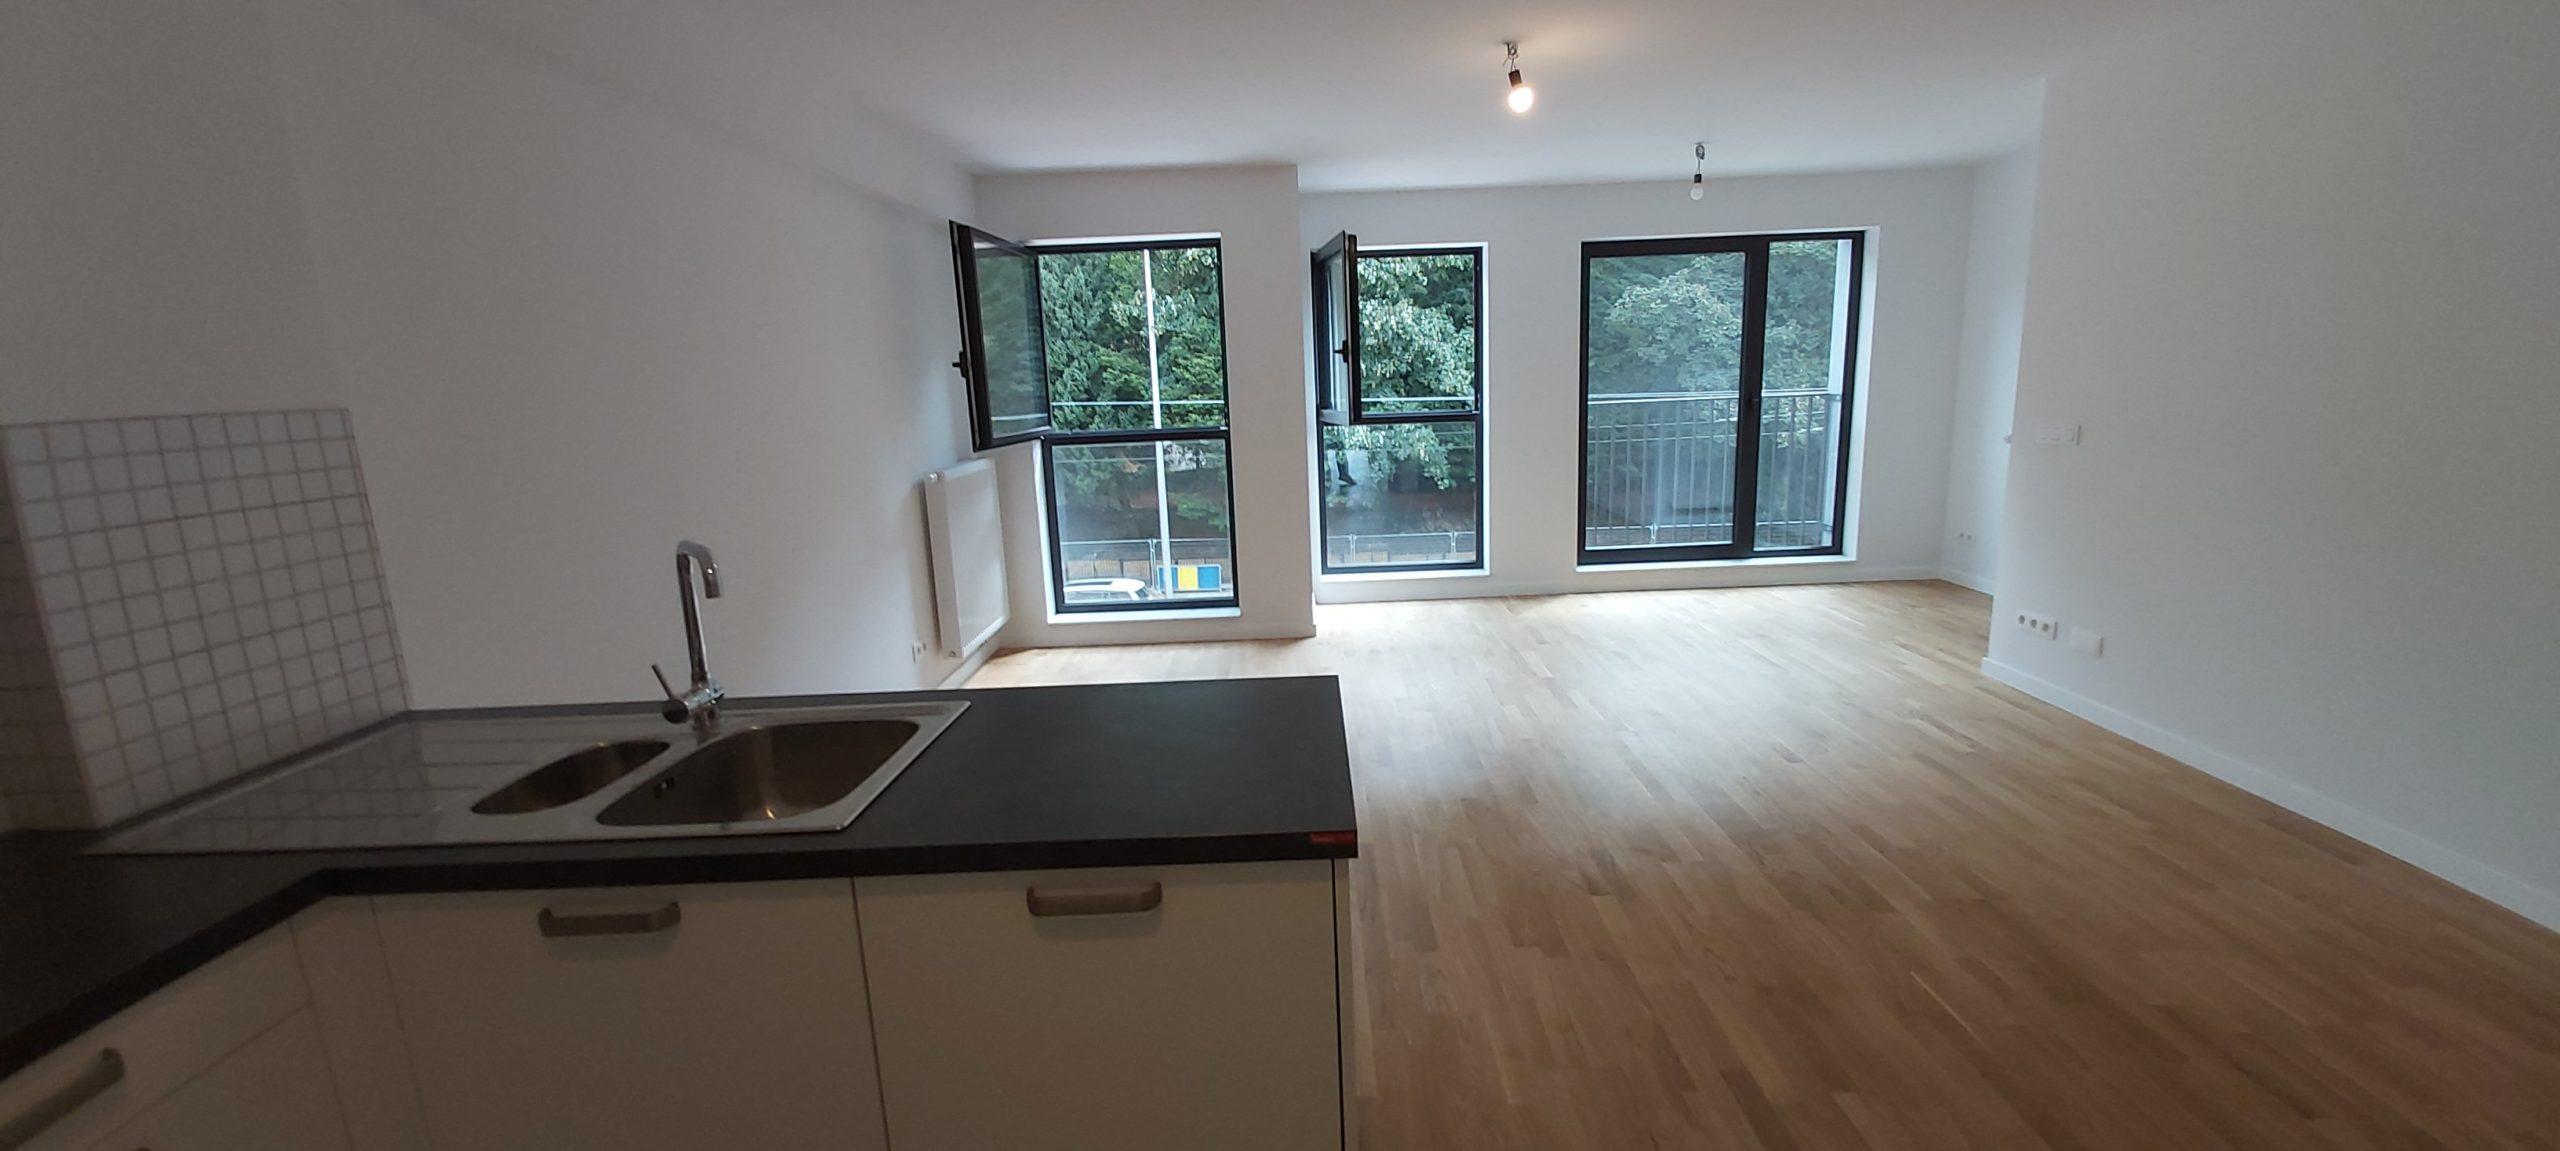 Face au domaine Royal, superbe appartement neuf 2 chs 2 sdb terrasse garage.